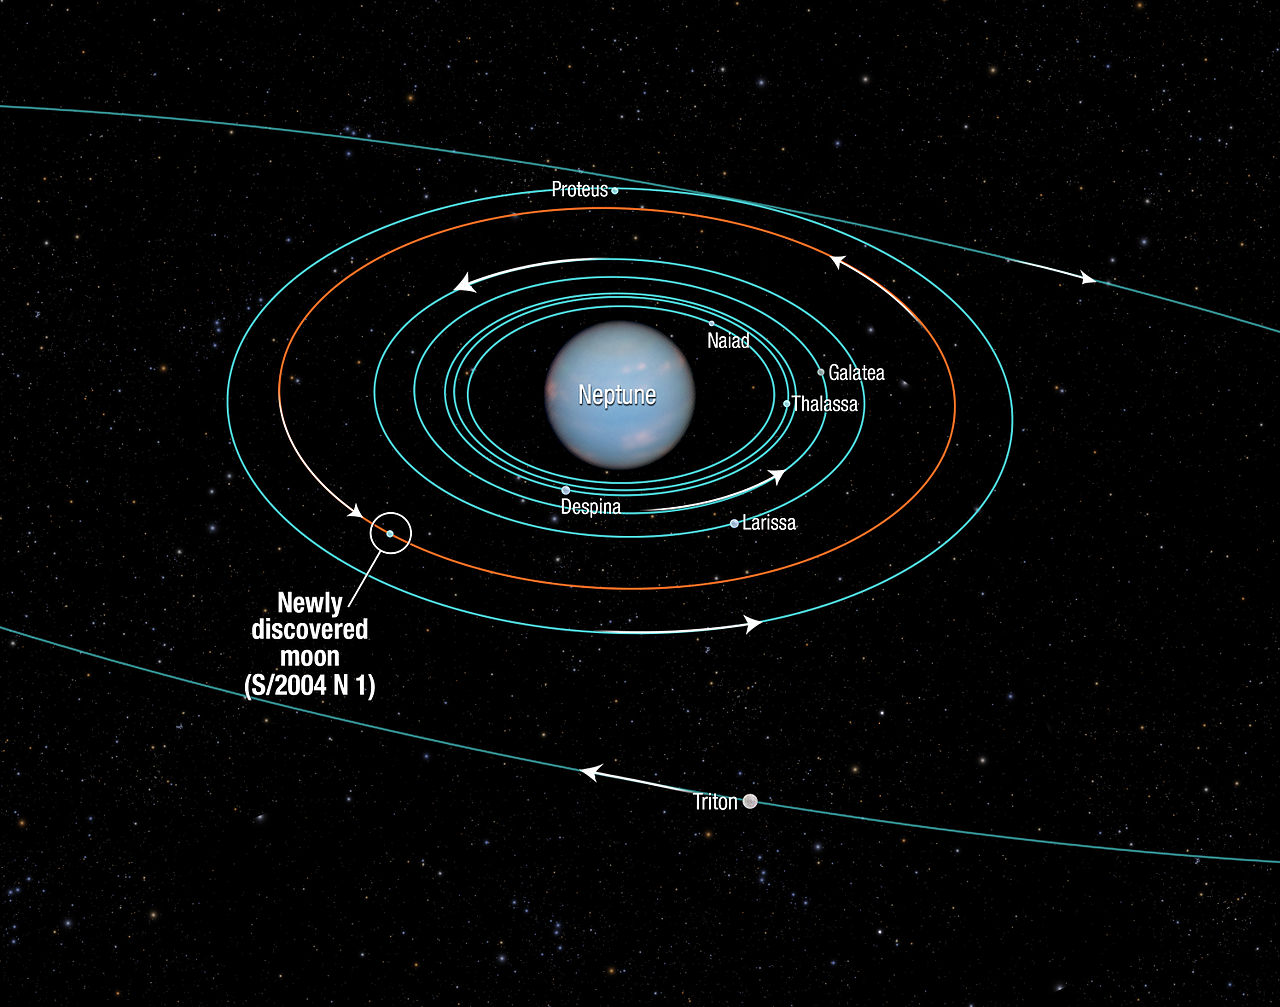 Fileorbits Of Inner Moons Neptune Including S 2004 N 1 Orbit Wiring Diagram